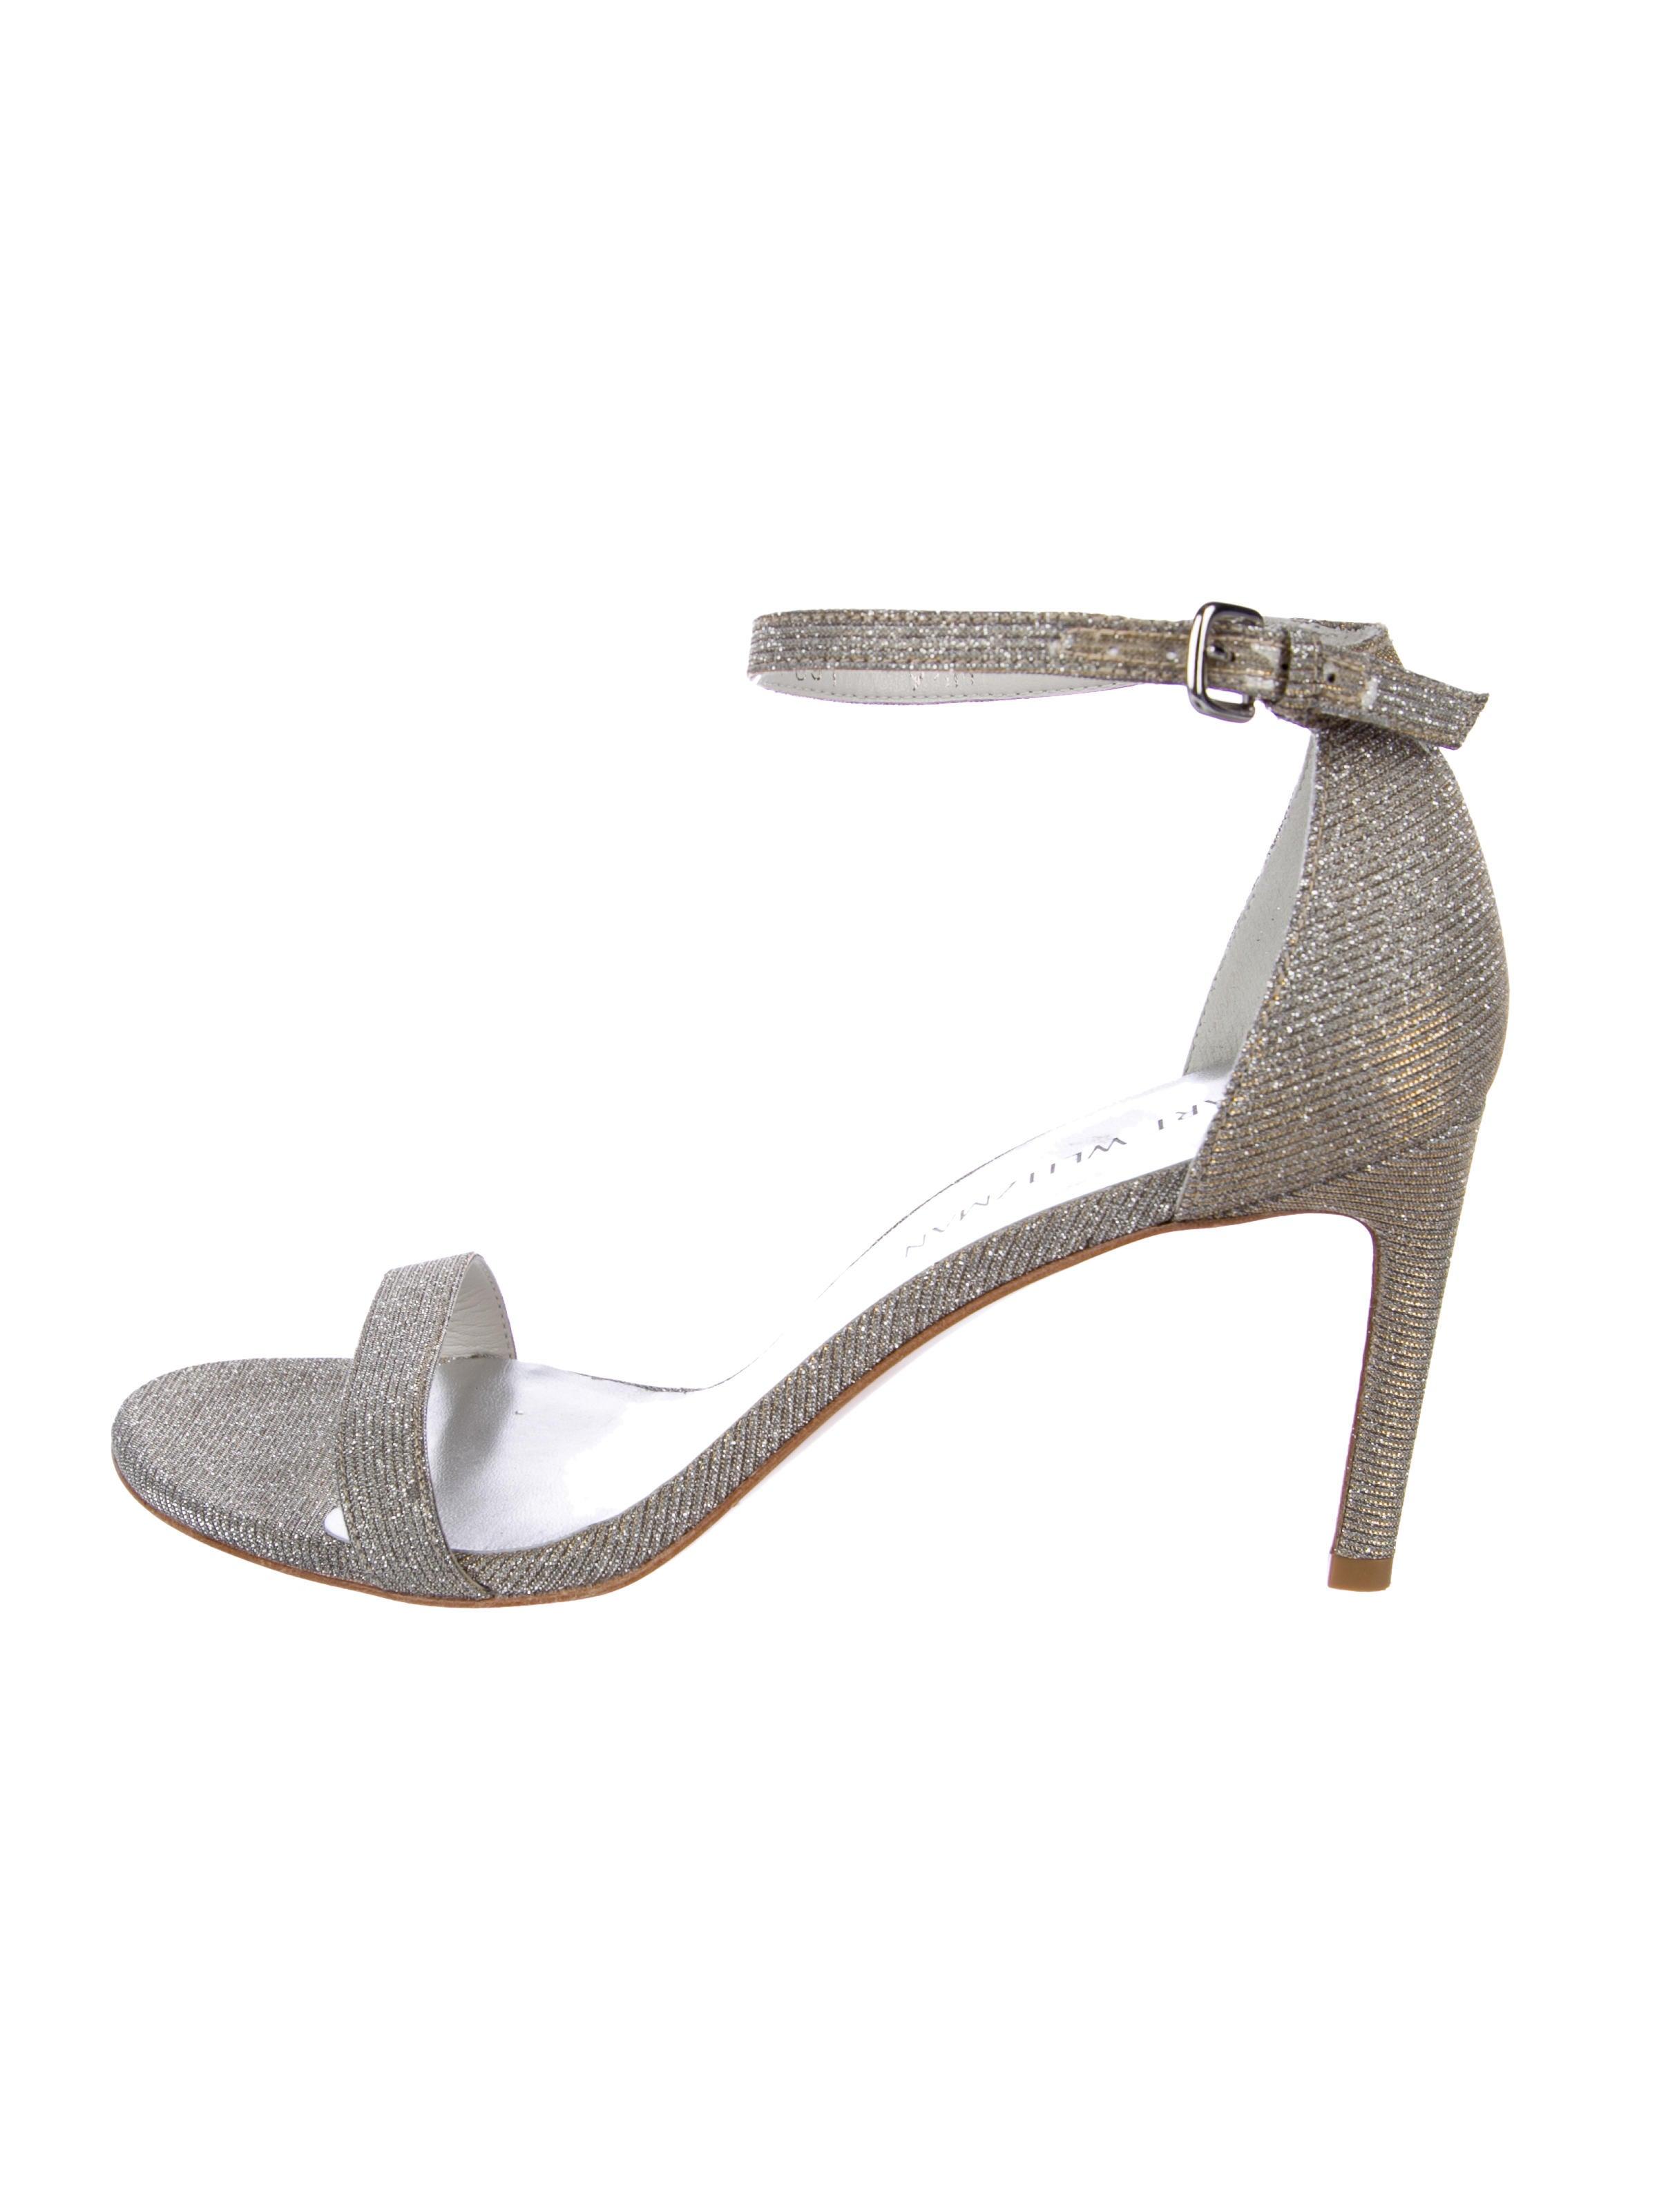 7257979cfa17 Stuart Weitzman Nudist Glitter Sandals - Shoes - WSU64703